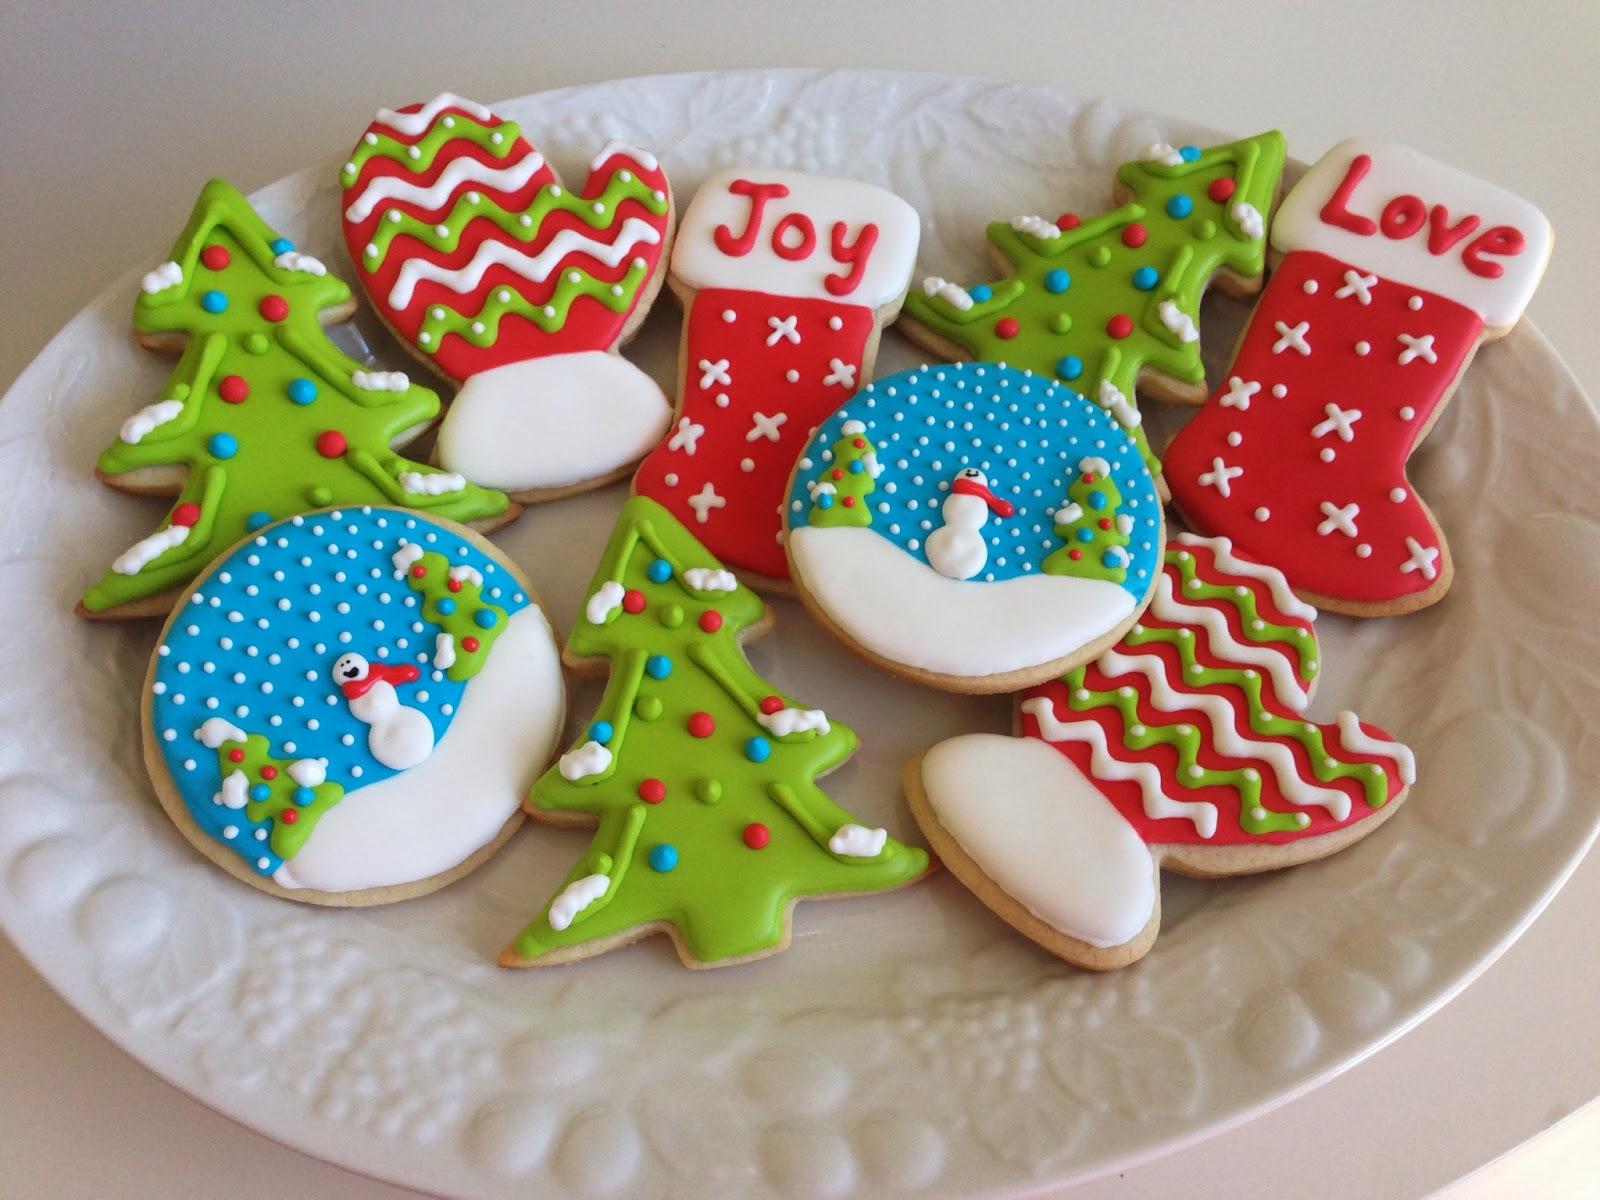 Christmas Cake Icing Recipe No Eggs: Decorating Christmas Sugar Cookies With Sprinkles